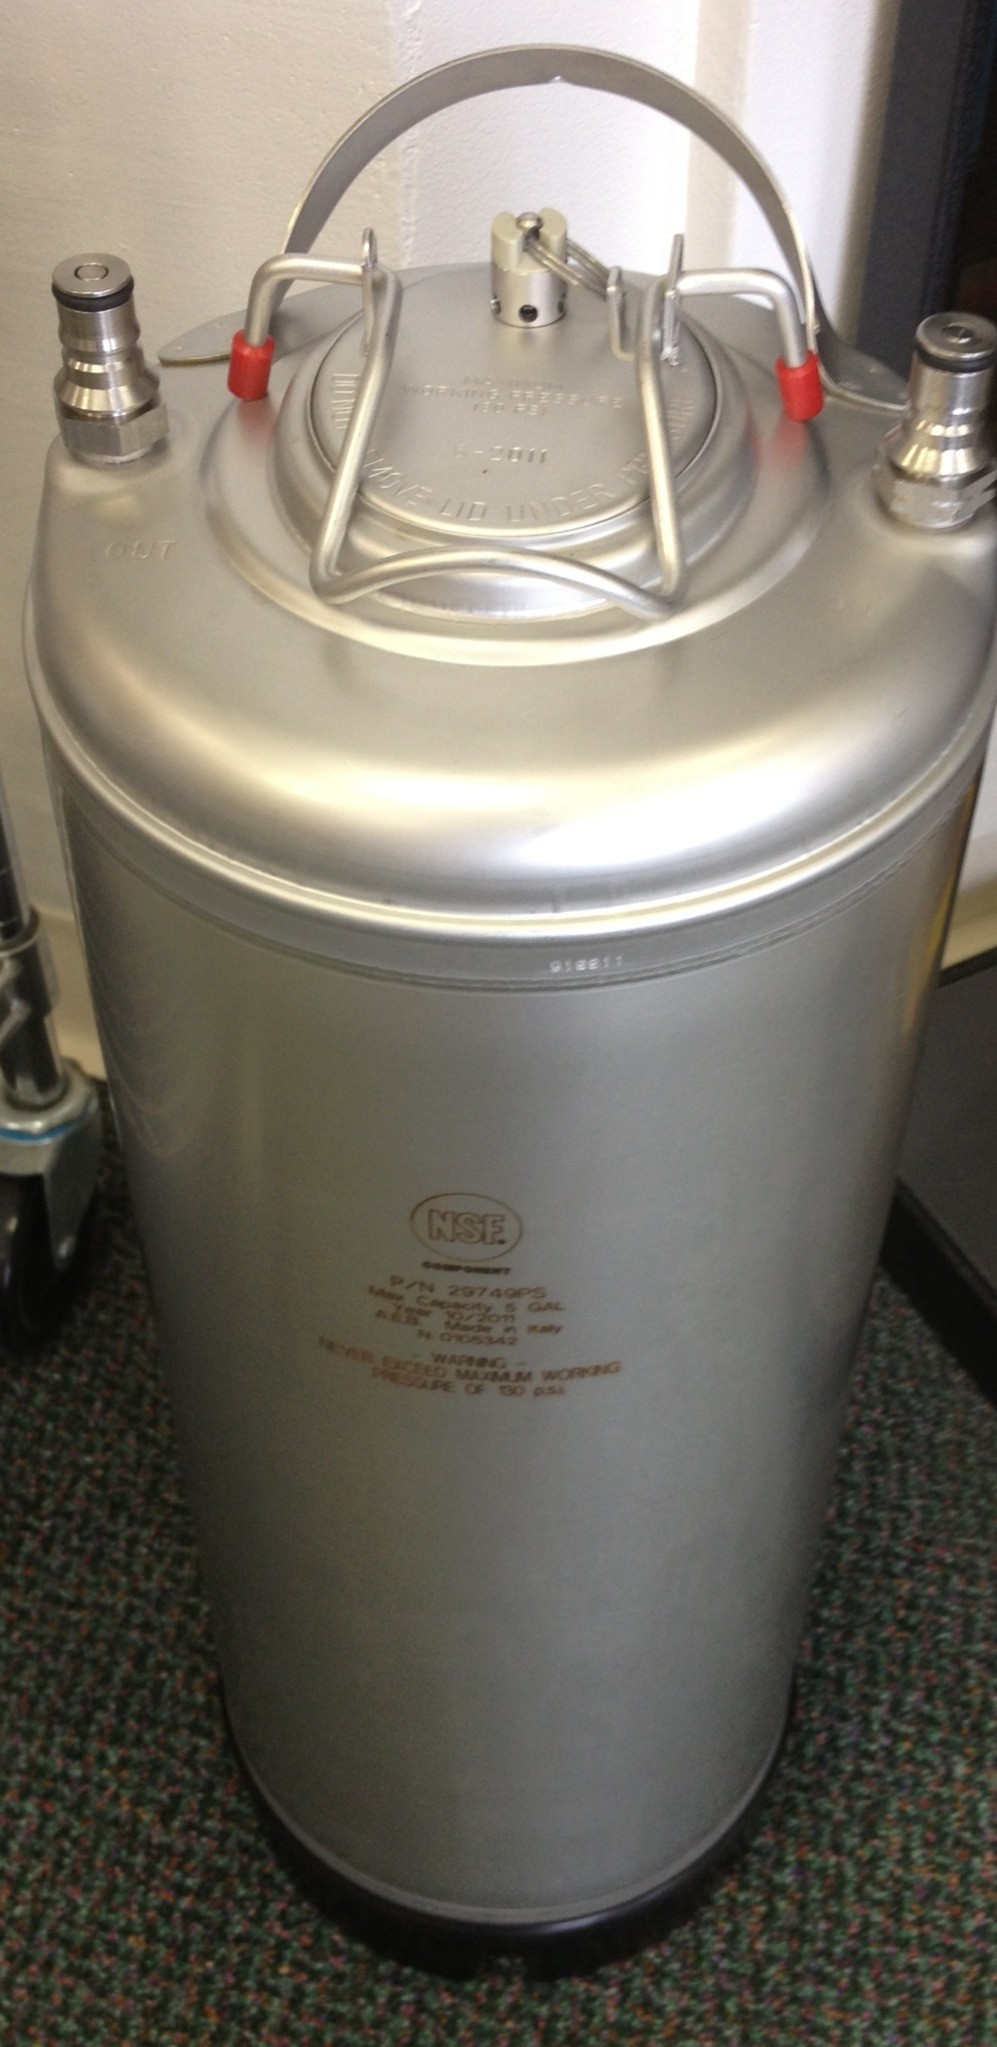 NEW 5 Gallon Ball Lock Keg - Rubber Bottom